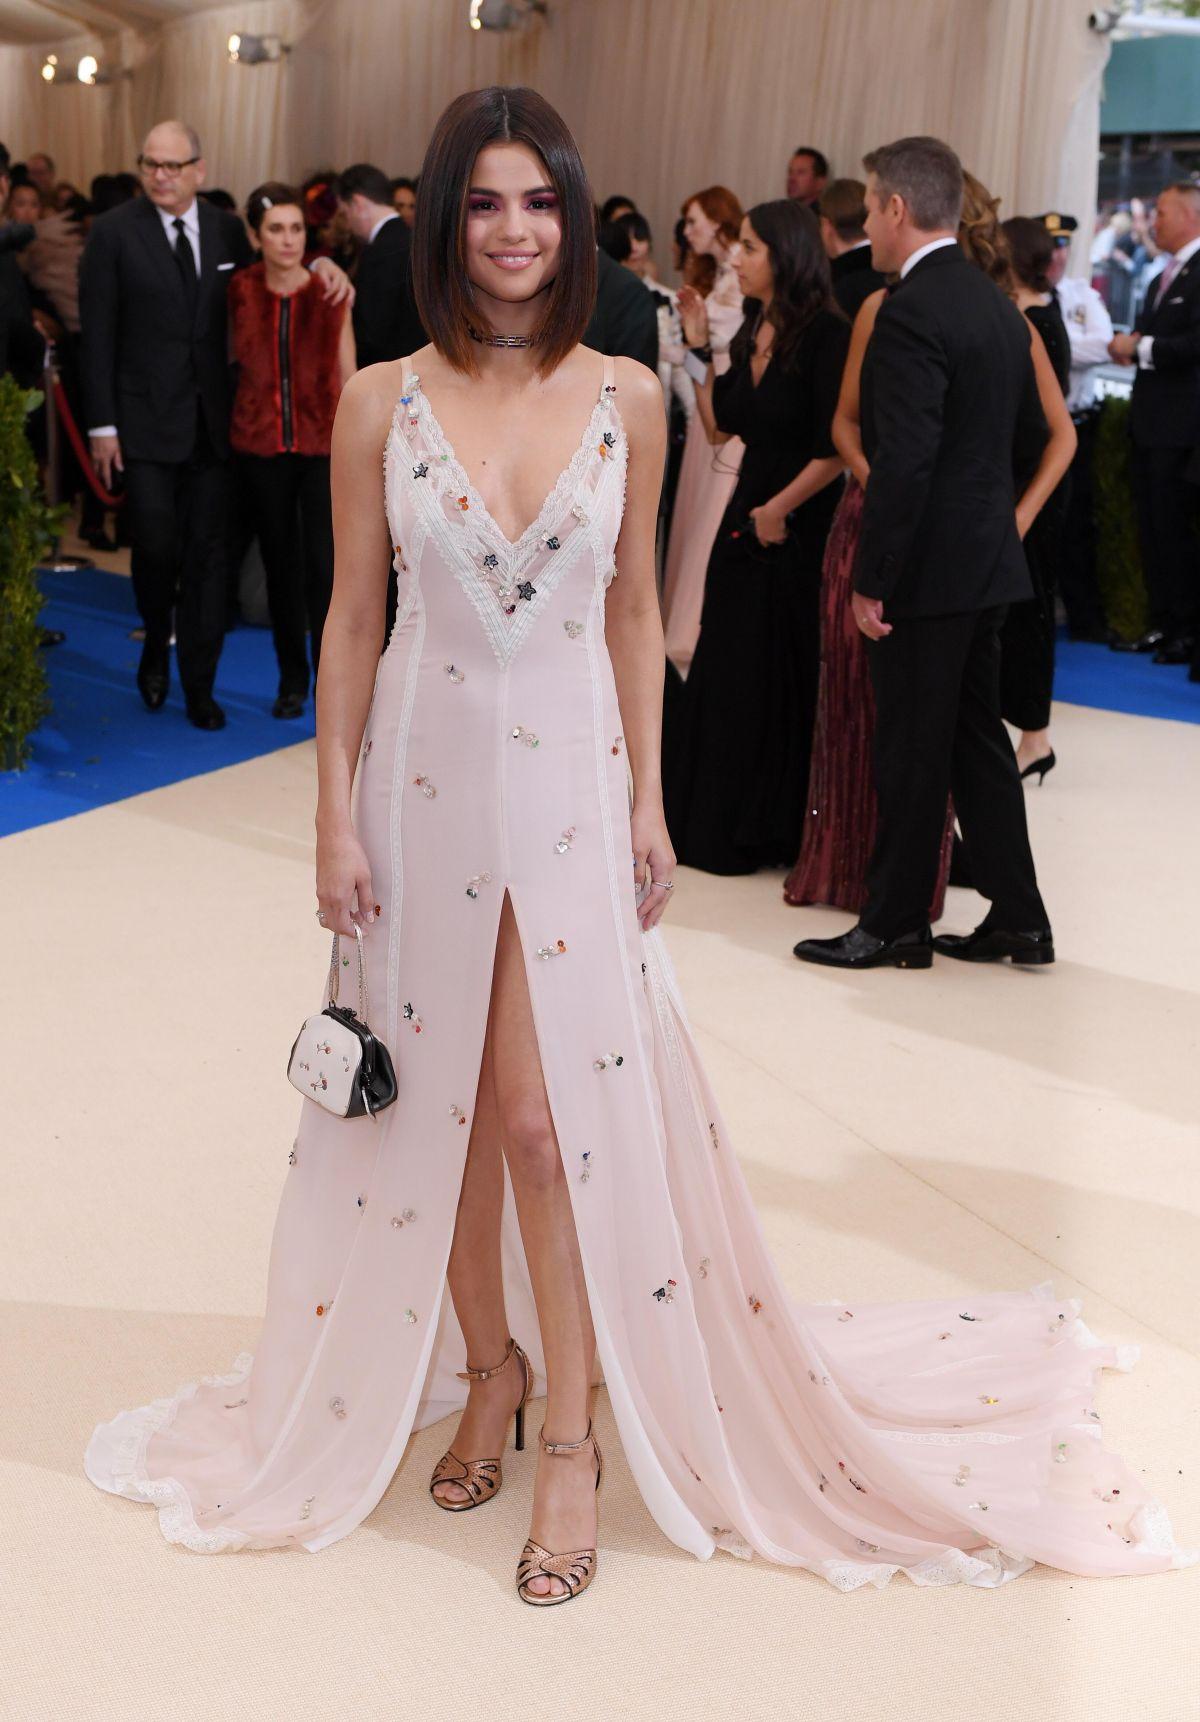 SELENA GOMEZ at 2017 MET Gala in New York 05/01/2017